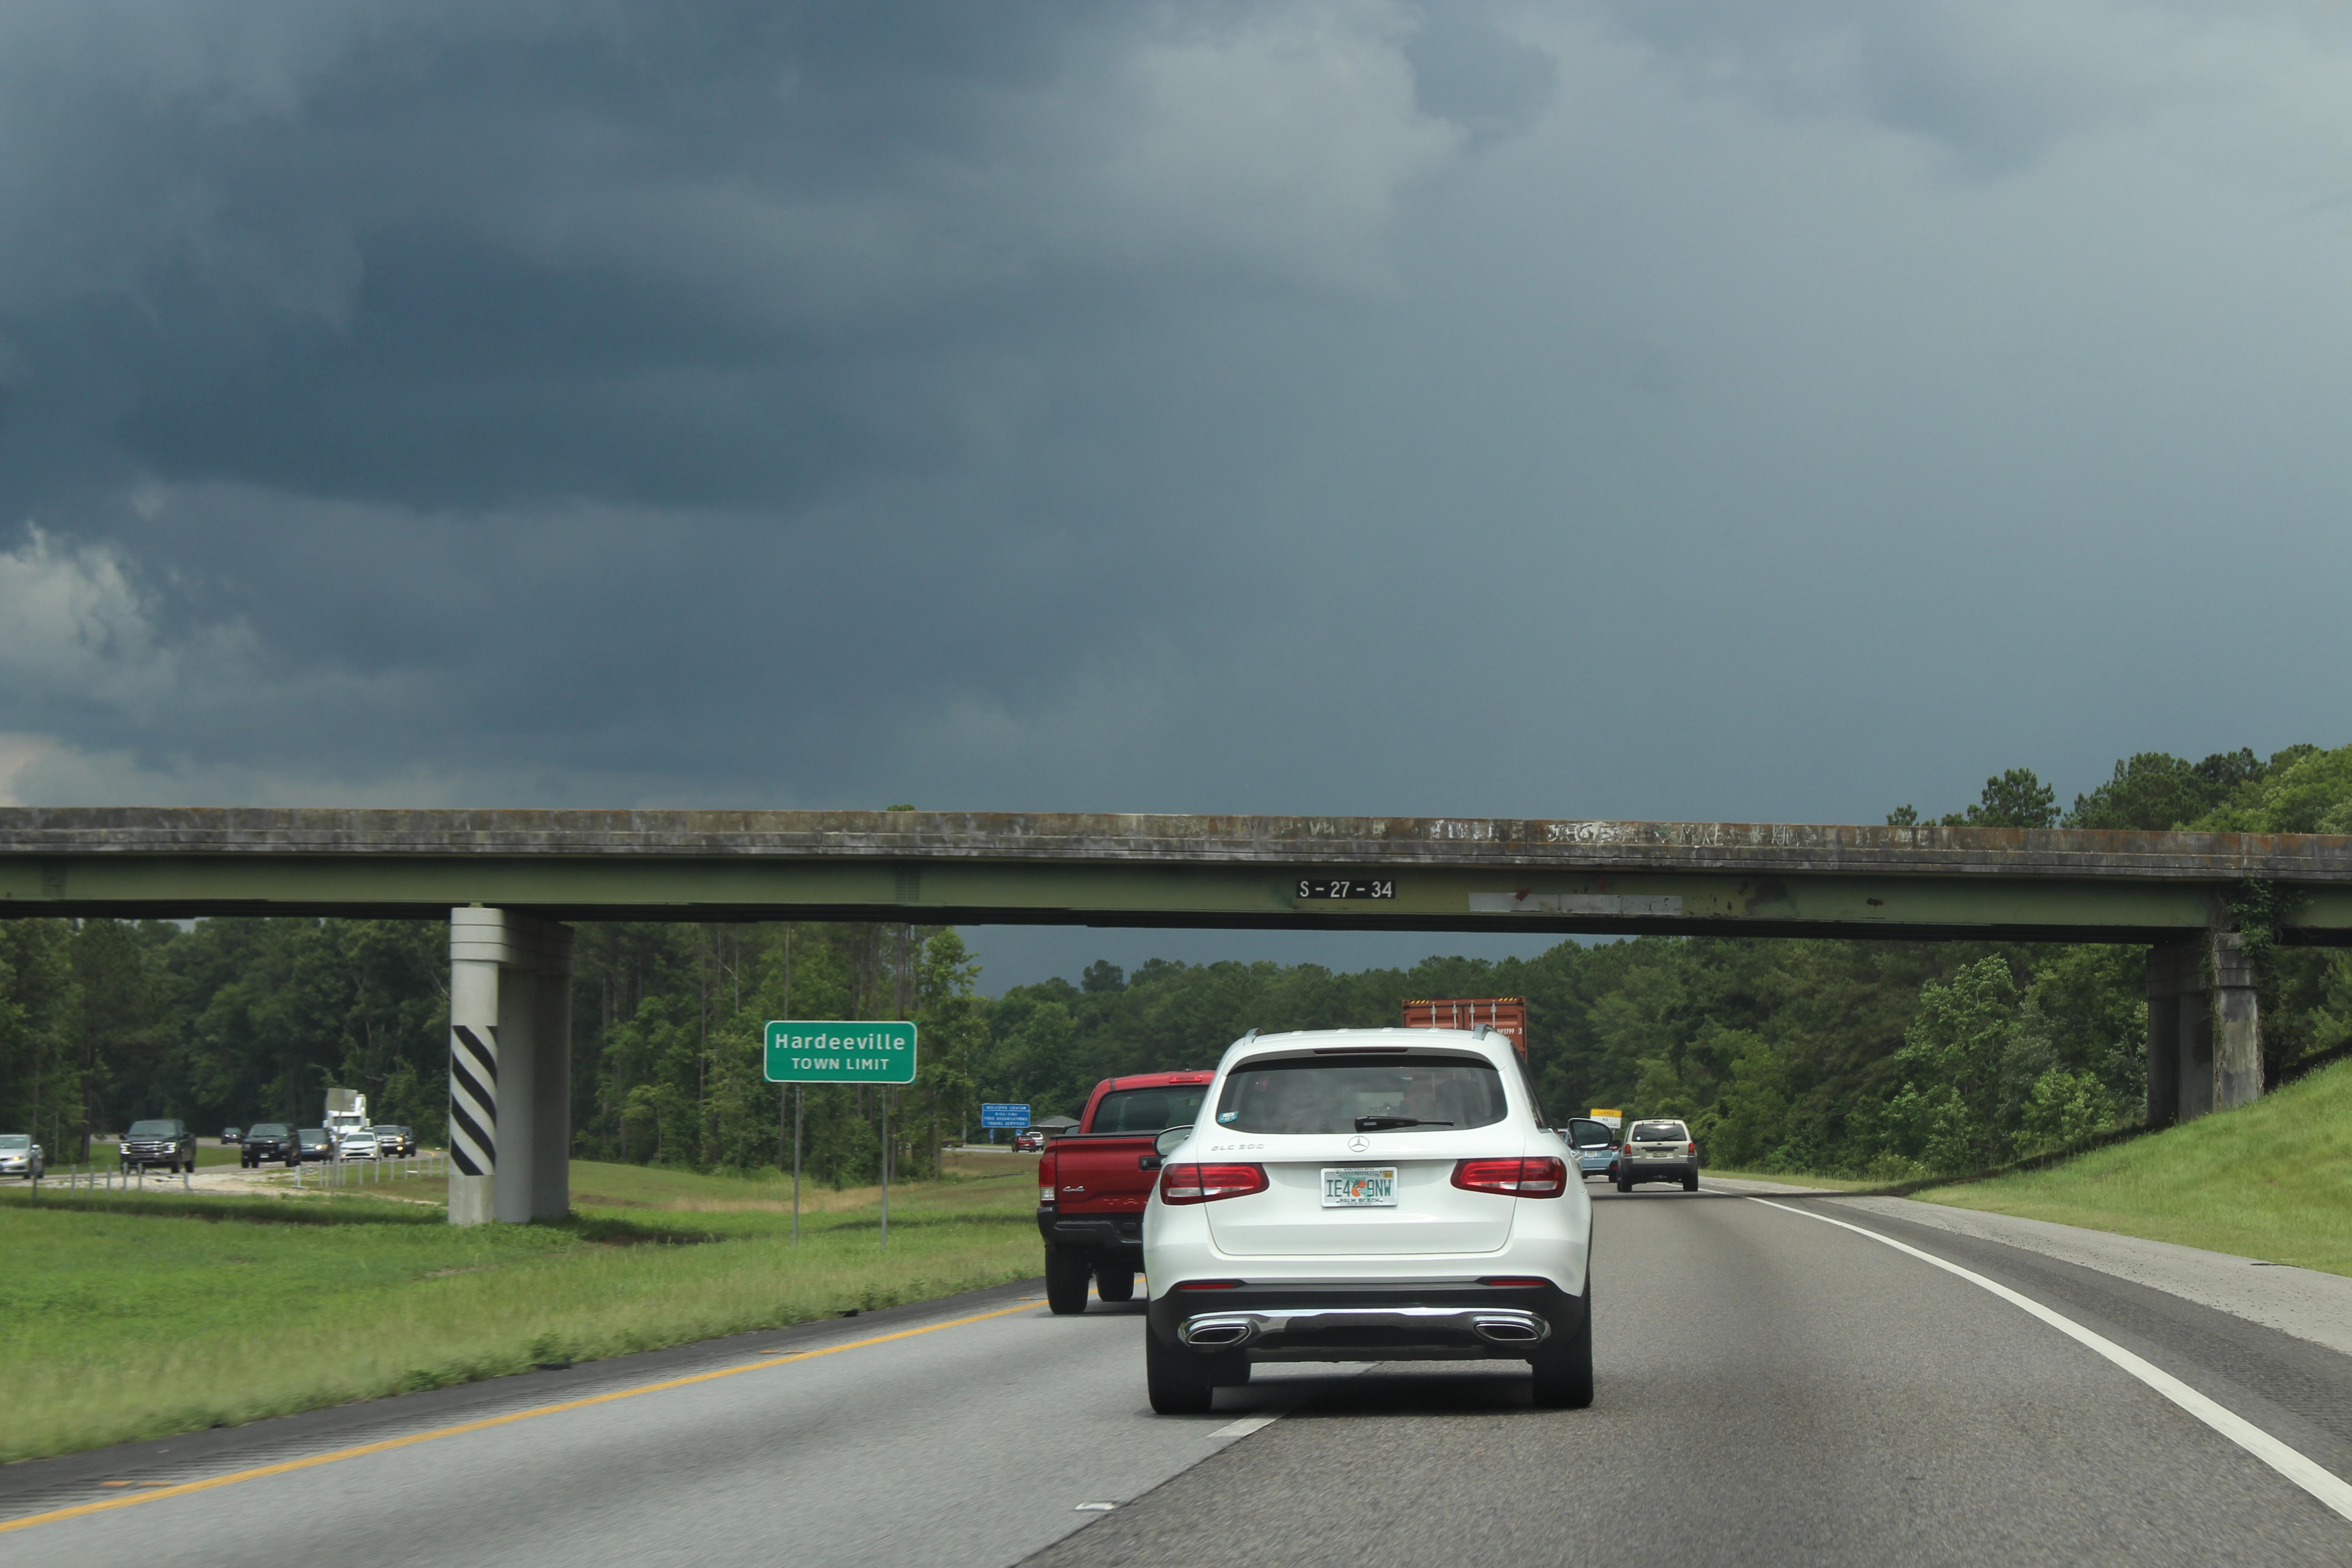 File:South Carolina I95nb Hardeeville town limit jpg